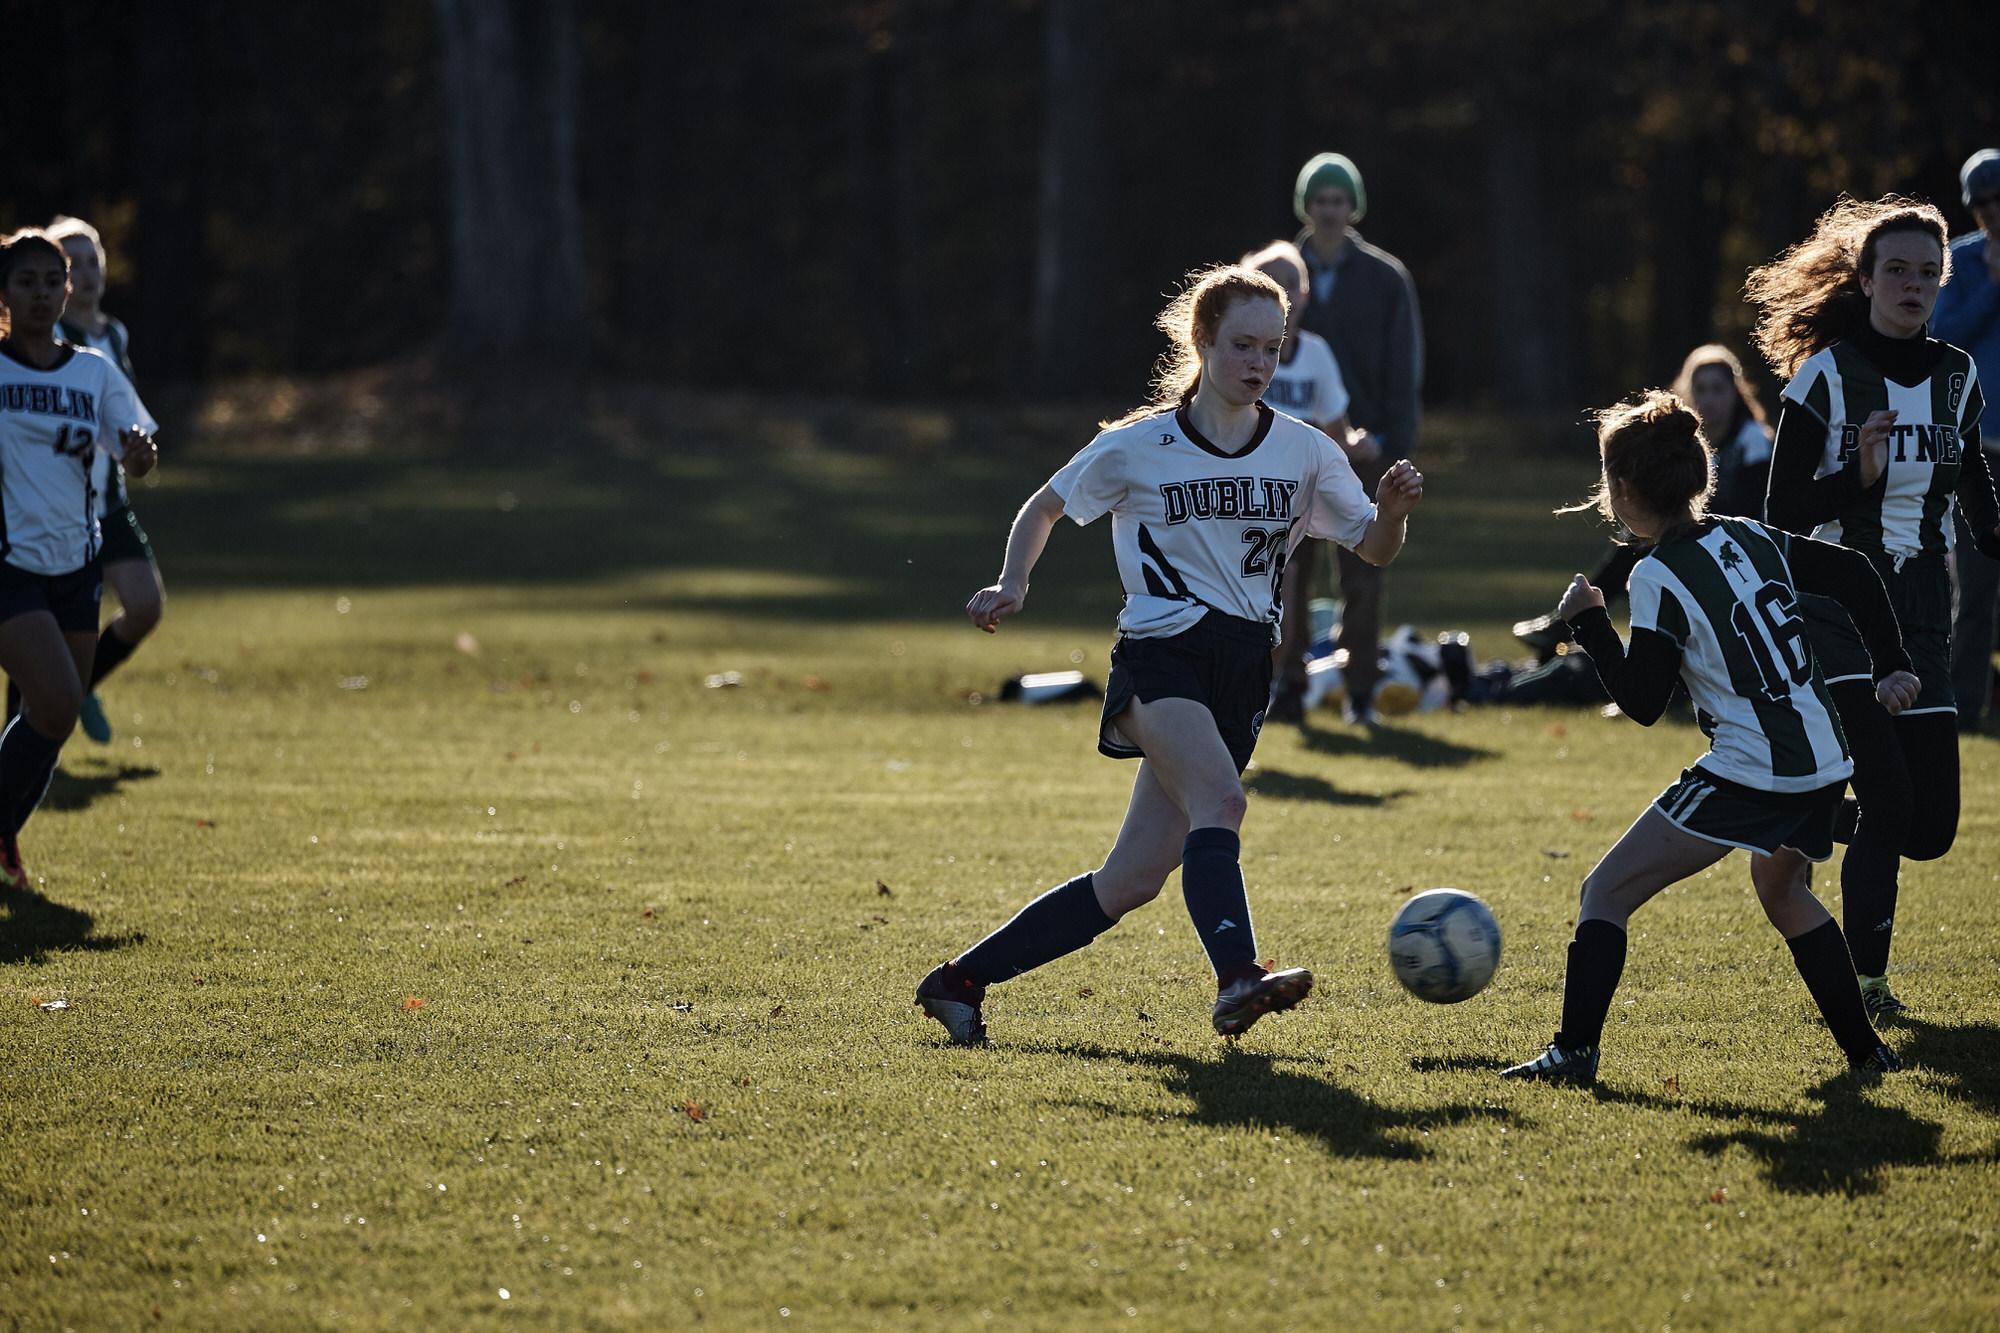 Girls Varsity Soccer vs. Putney School - October 26, 2018 - 033.jpg